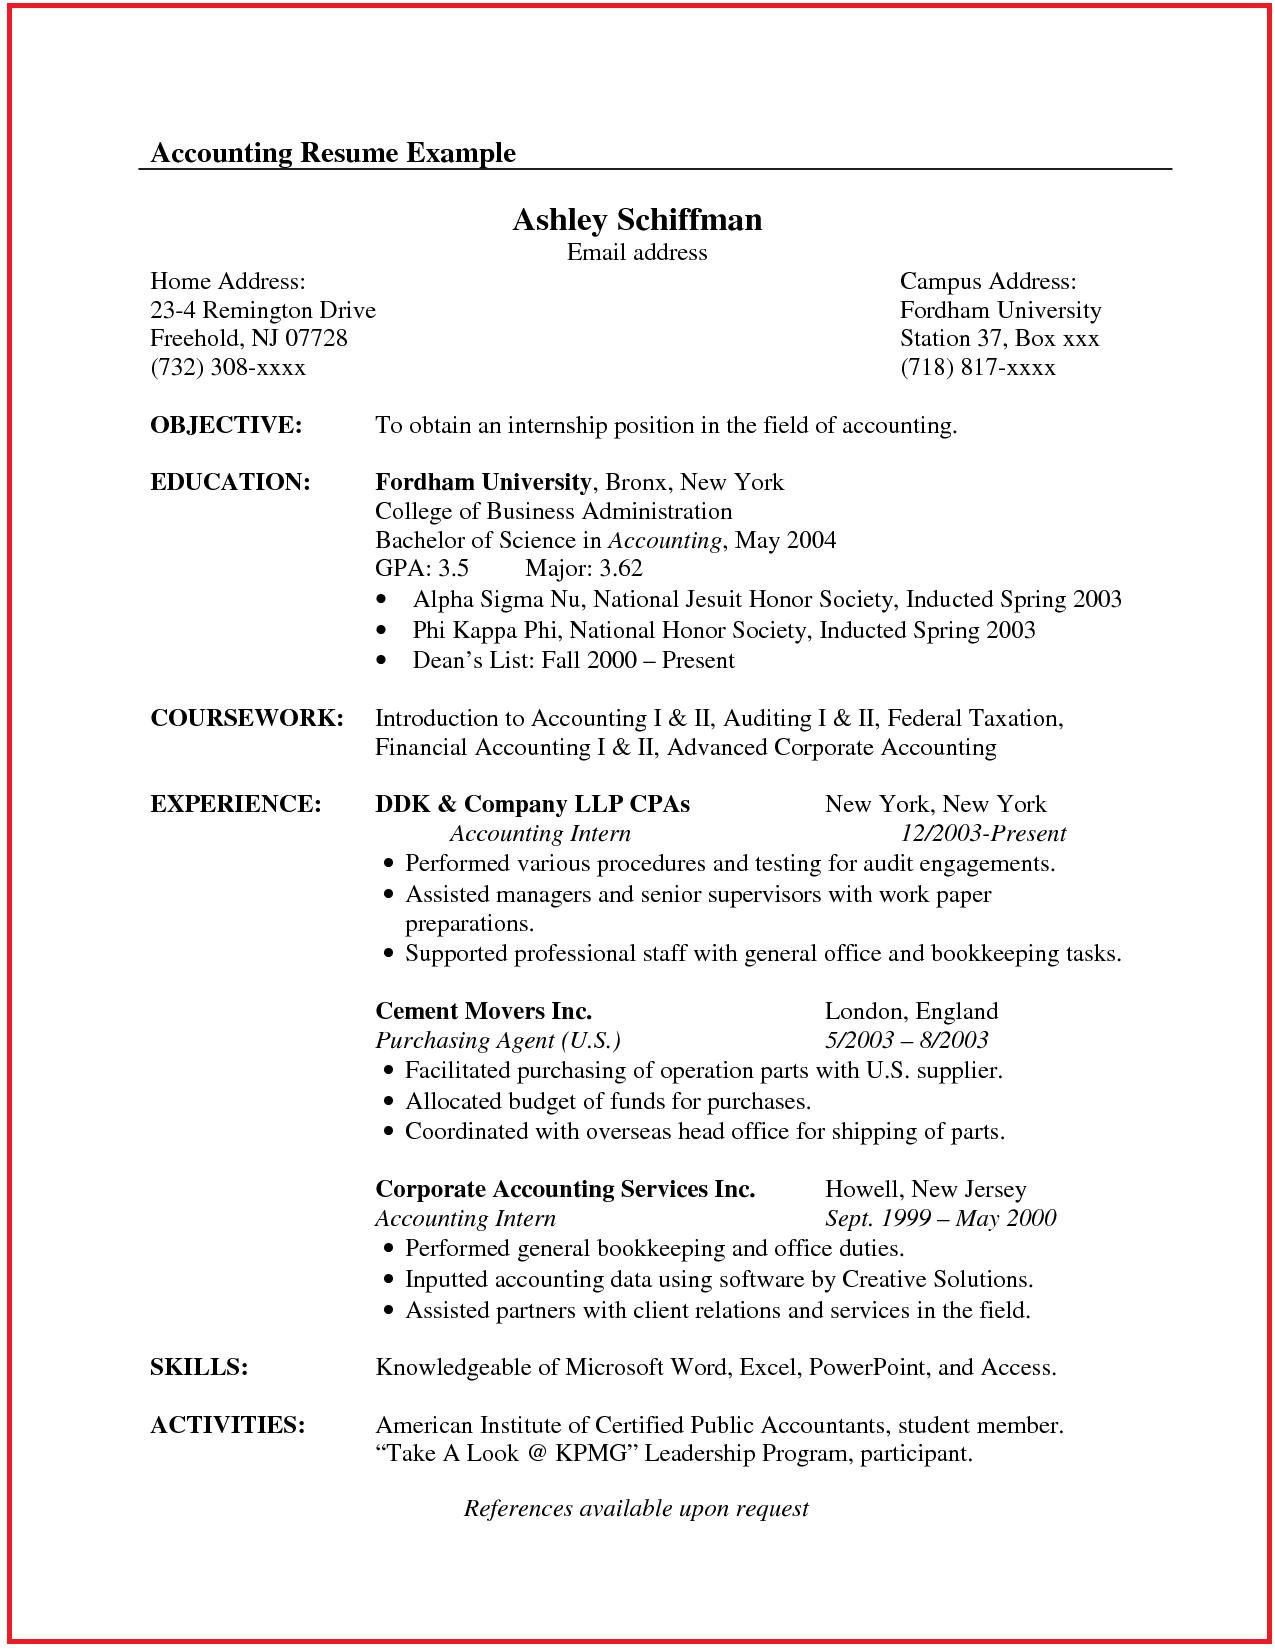 Resume Template Canada - Resume Sample